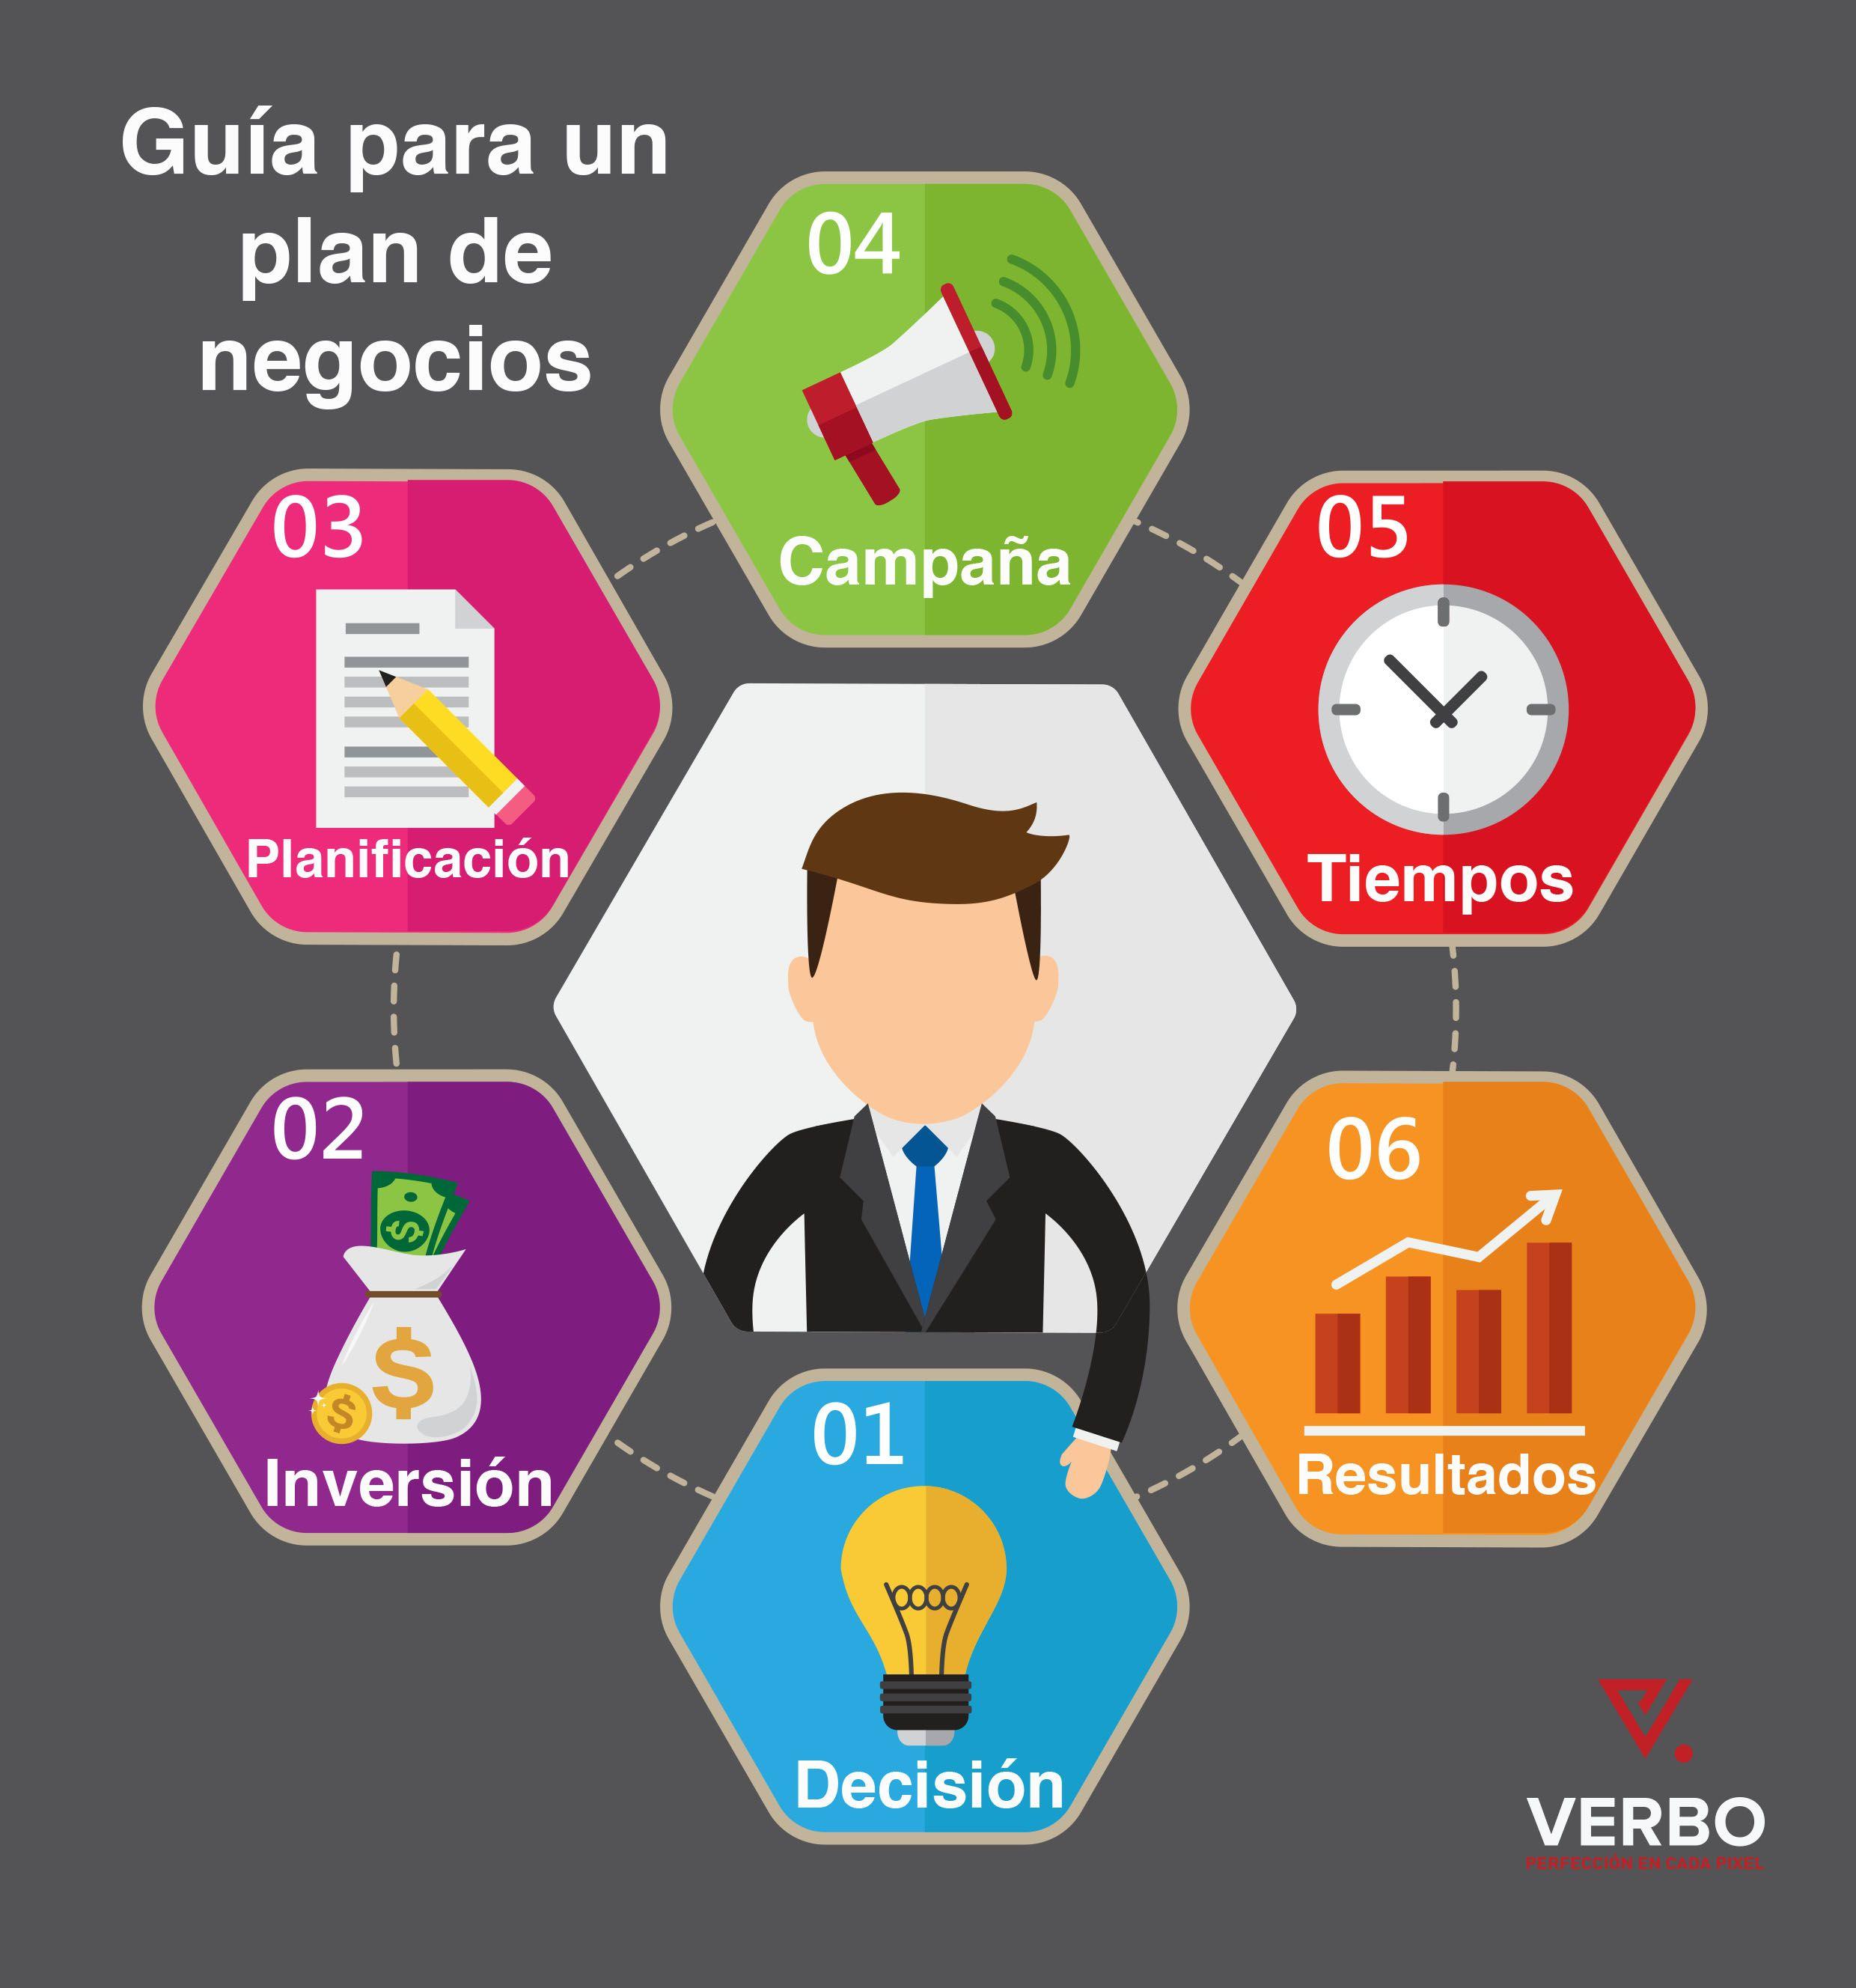 Pin de VERBO Comunicación en Planes de Negocio | Pinterest | Plan de ...